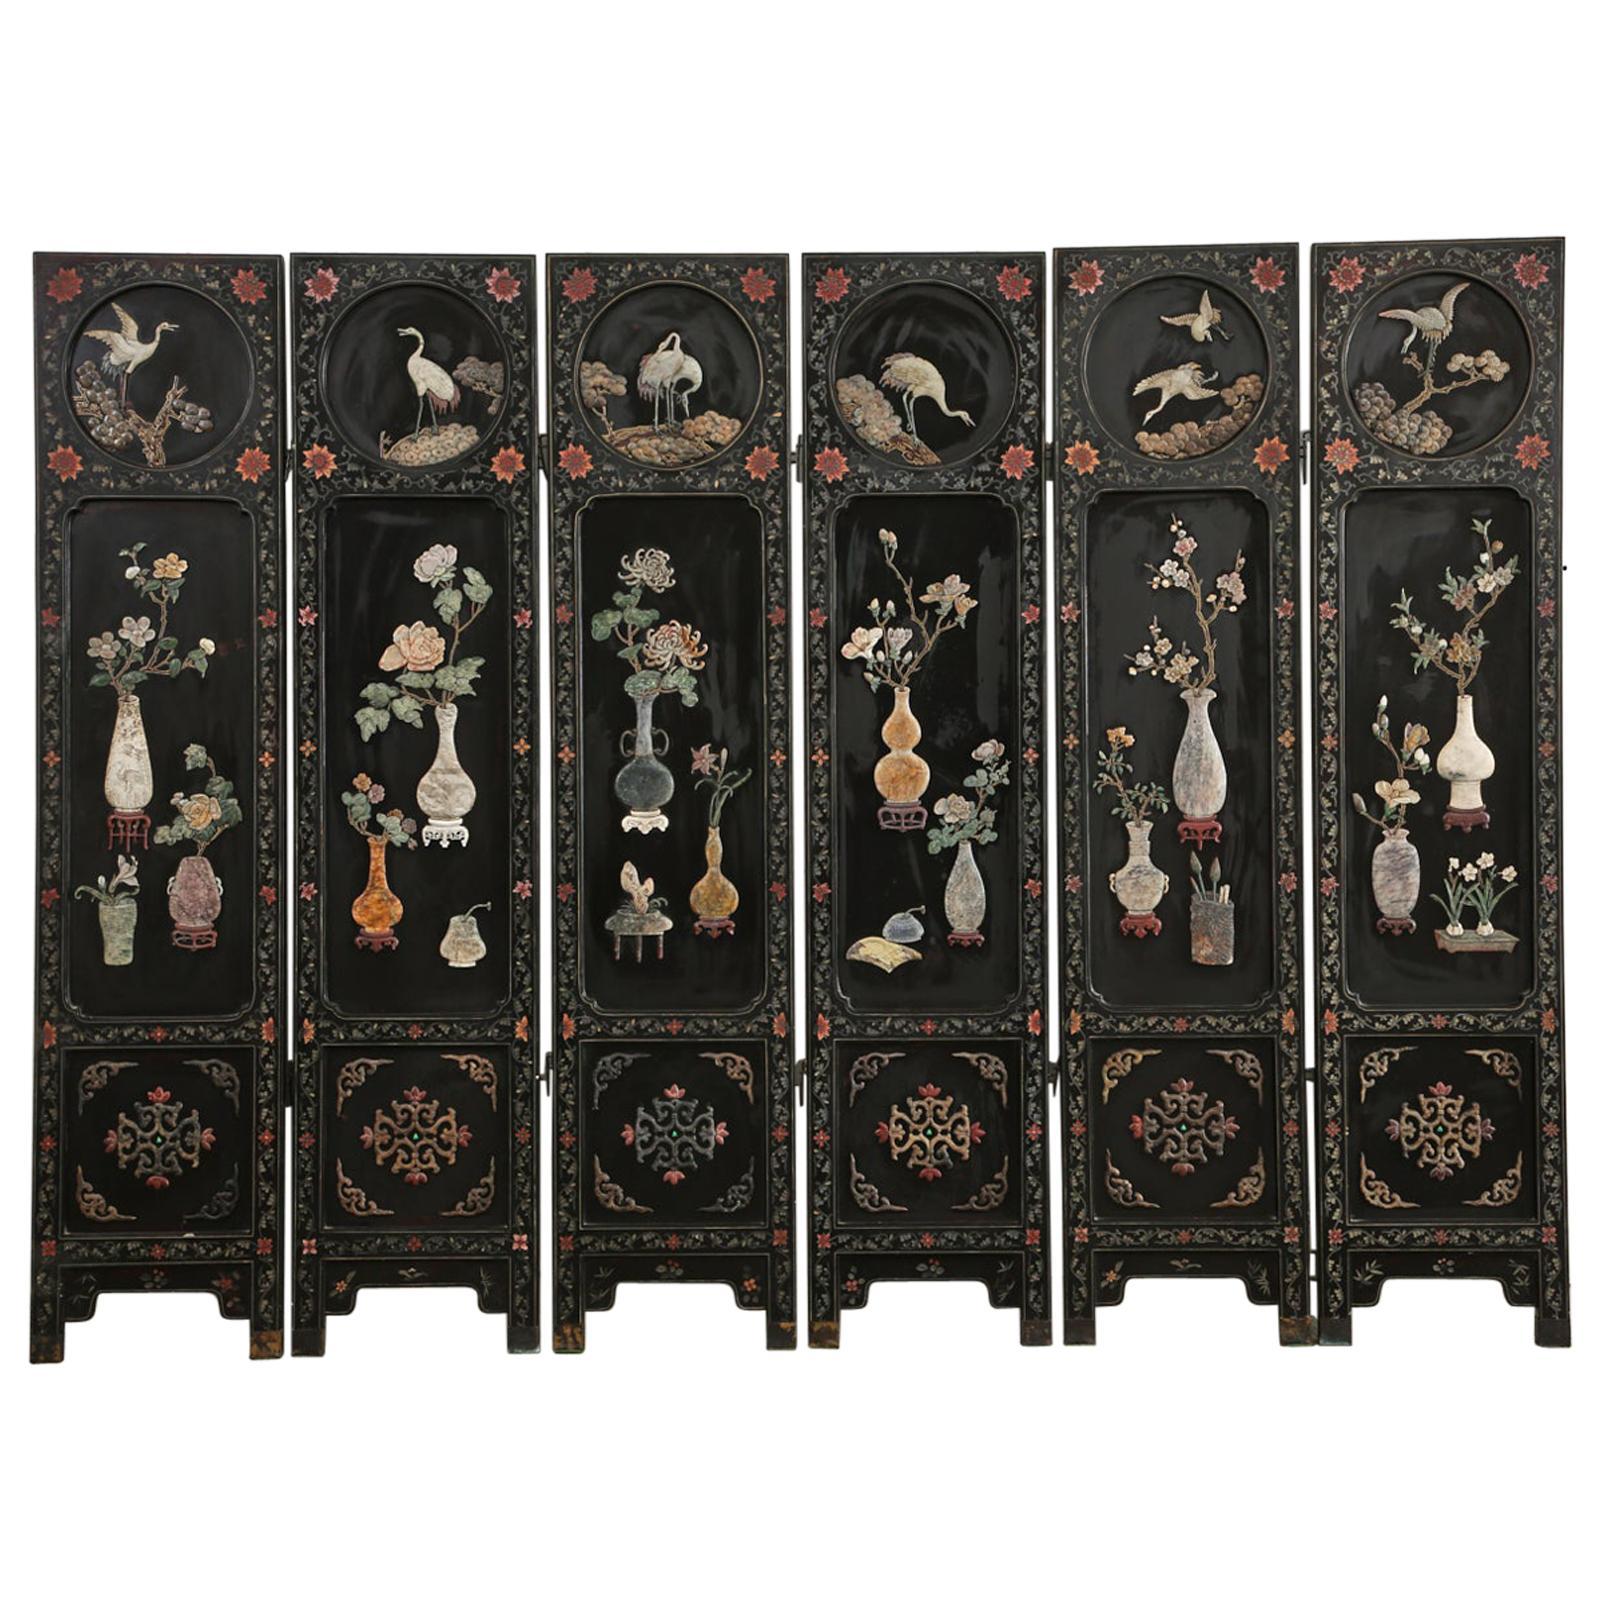 Chinese Export Six Panel Lacquered Hard Stone Coromandel Screen